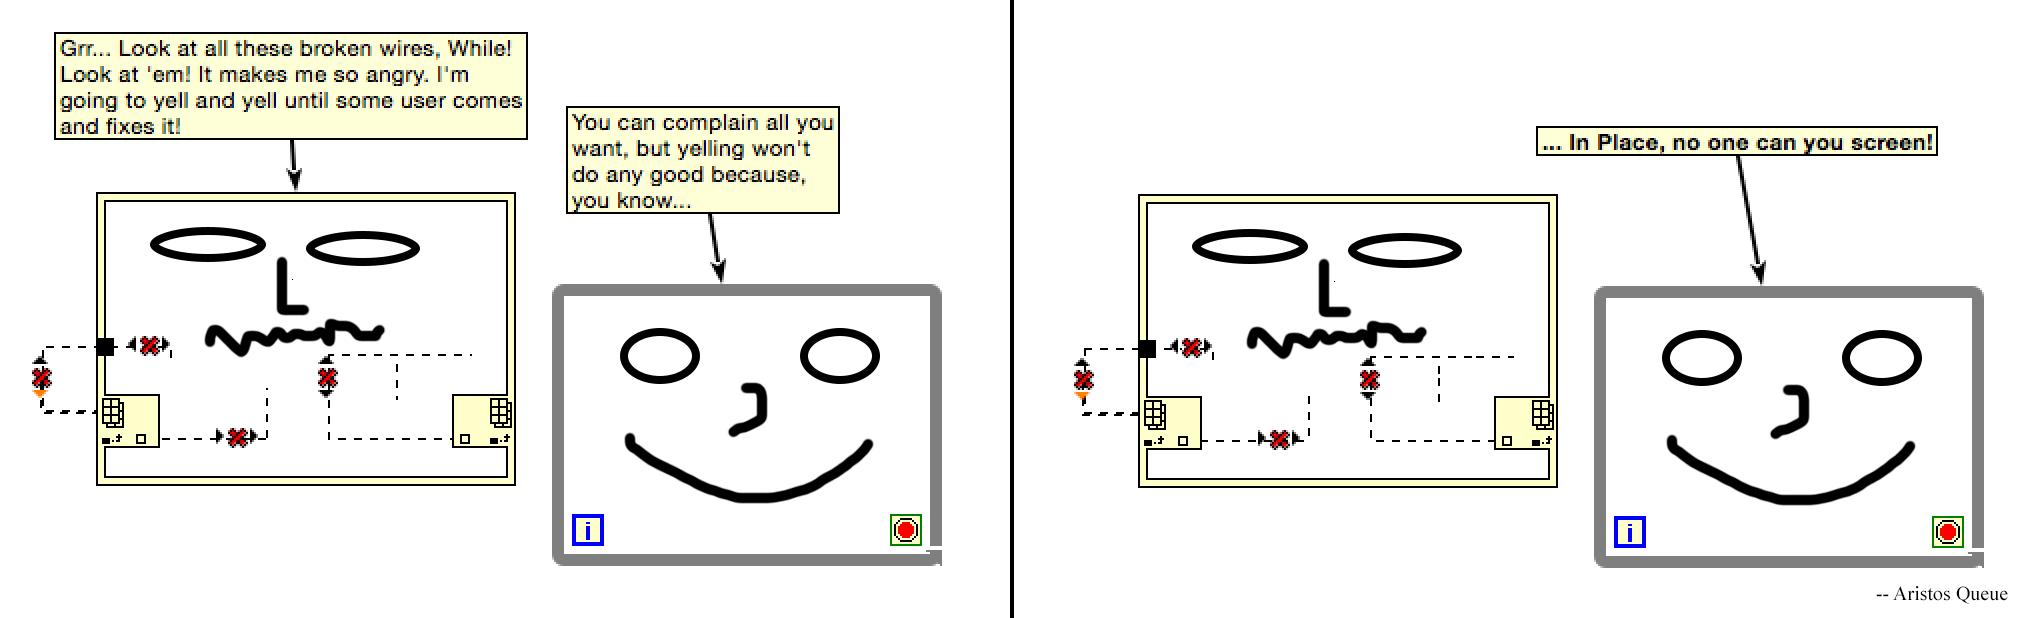 InPlaceProblem.png